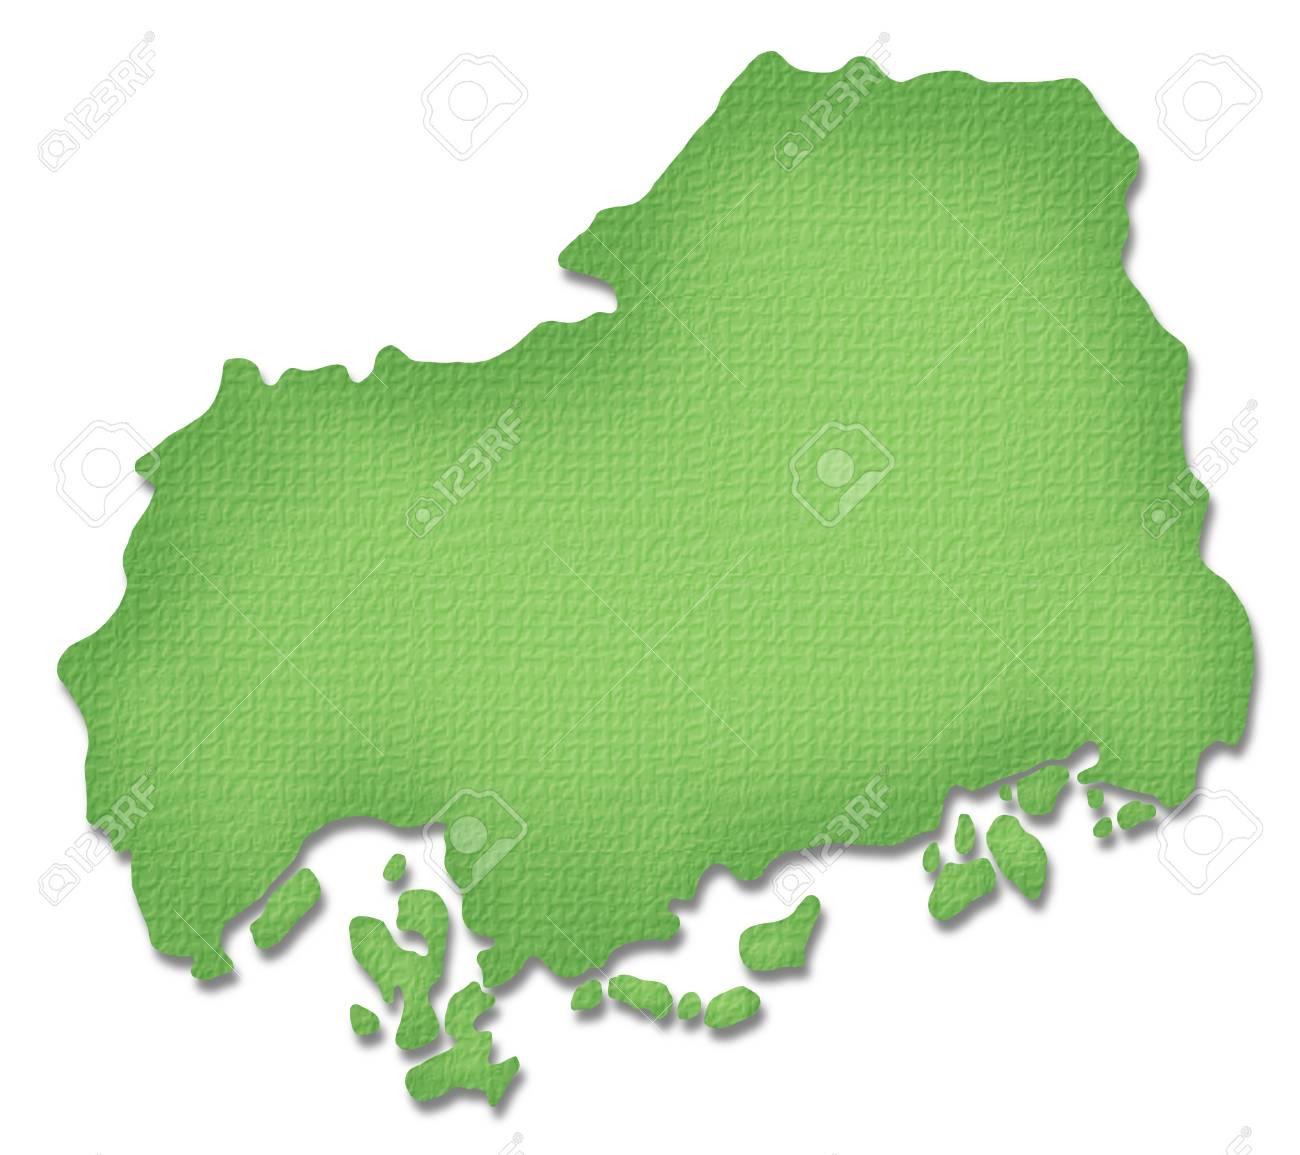 Hiroshima Prefecture map of Paper Craft tone